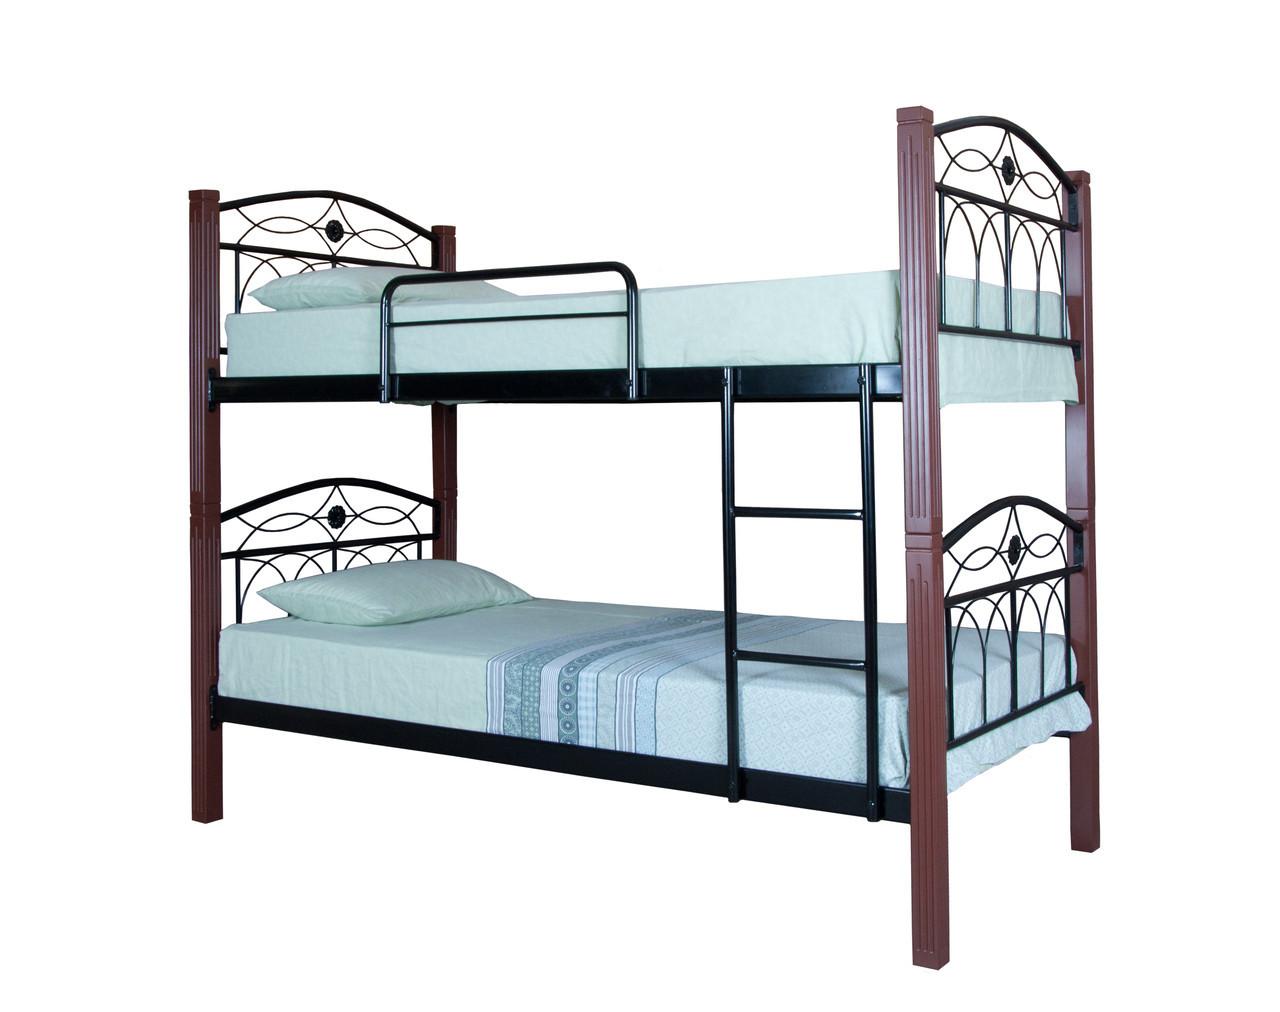 Кровать Элизабет двухъярусная  200х90, ультрамарин